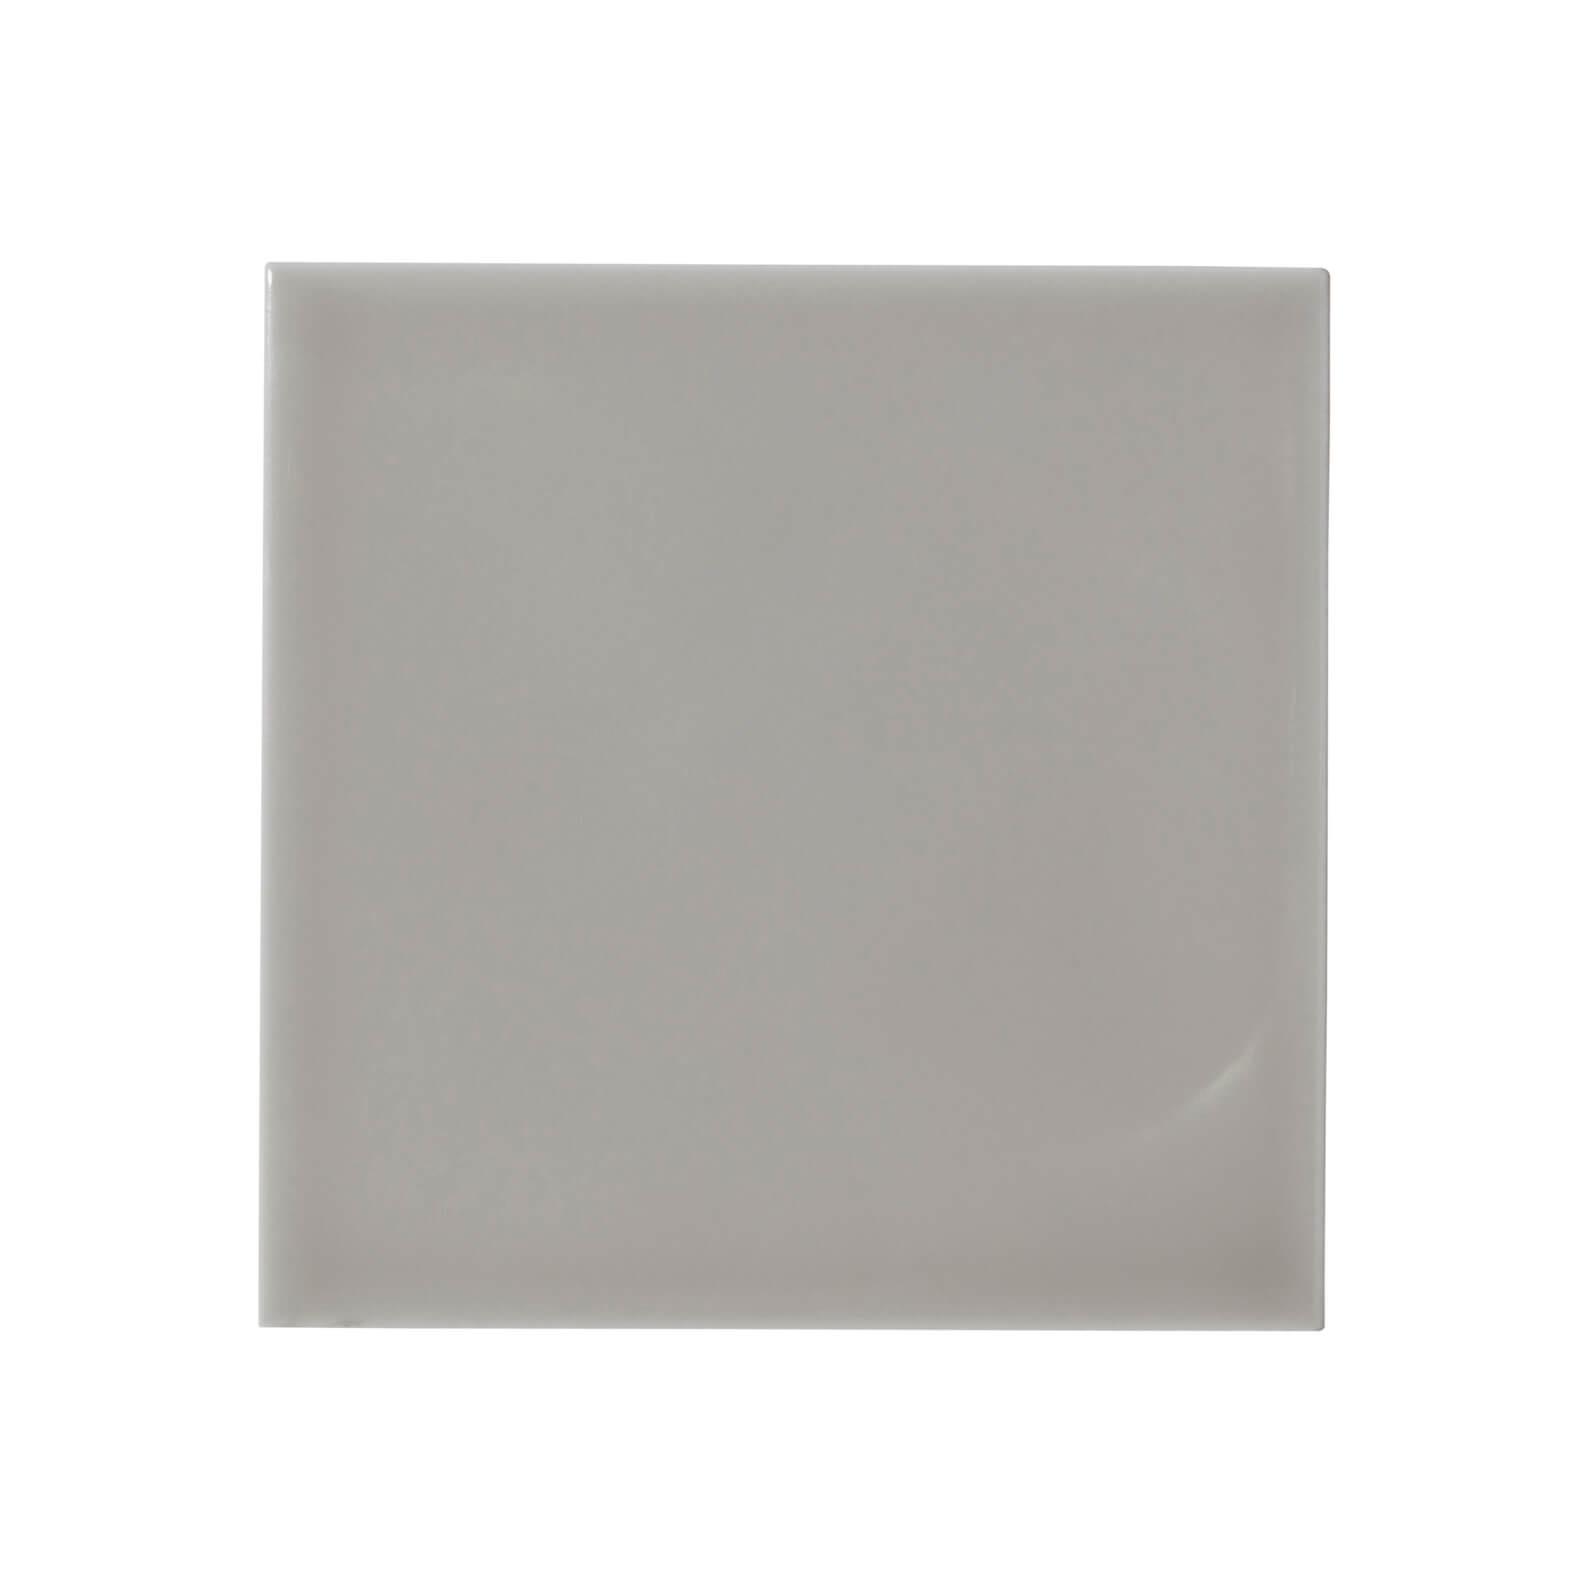 ADST1009 - LISO  - 14.8 cm X 14.8 cm